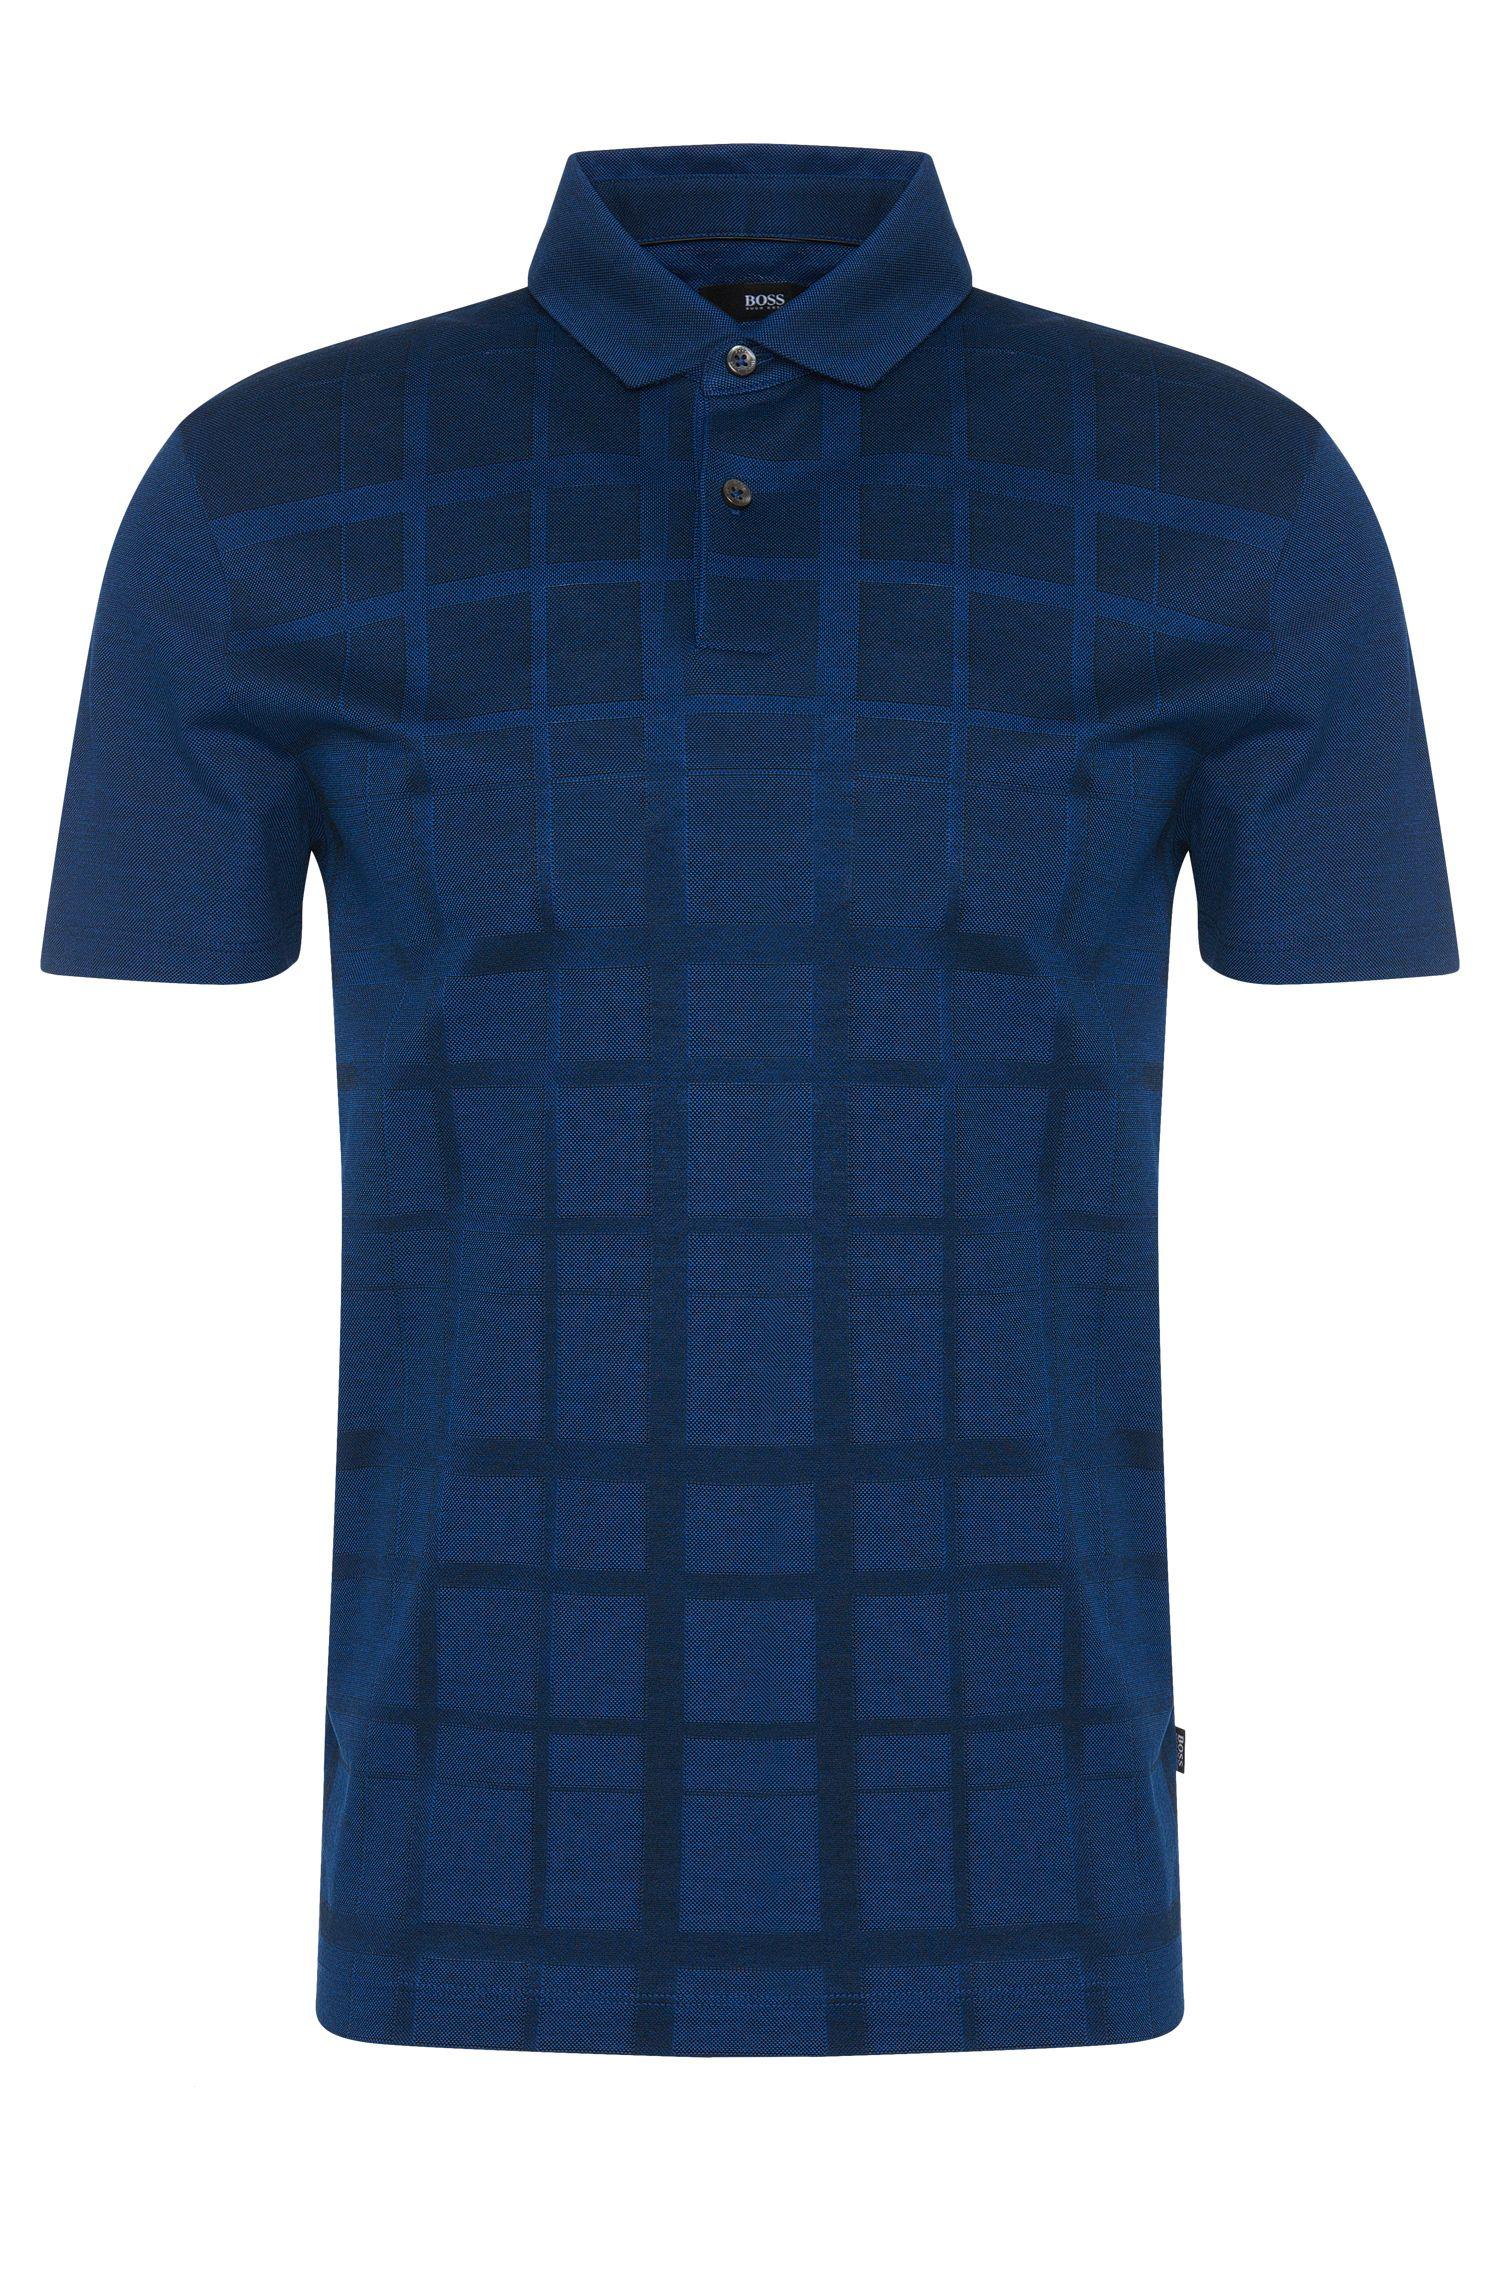 'Press' | Regular Fit, Mercerized Cotton Polo Shirt